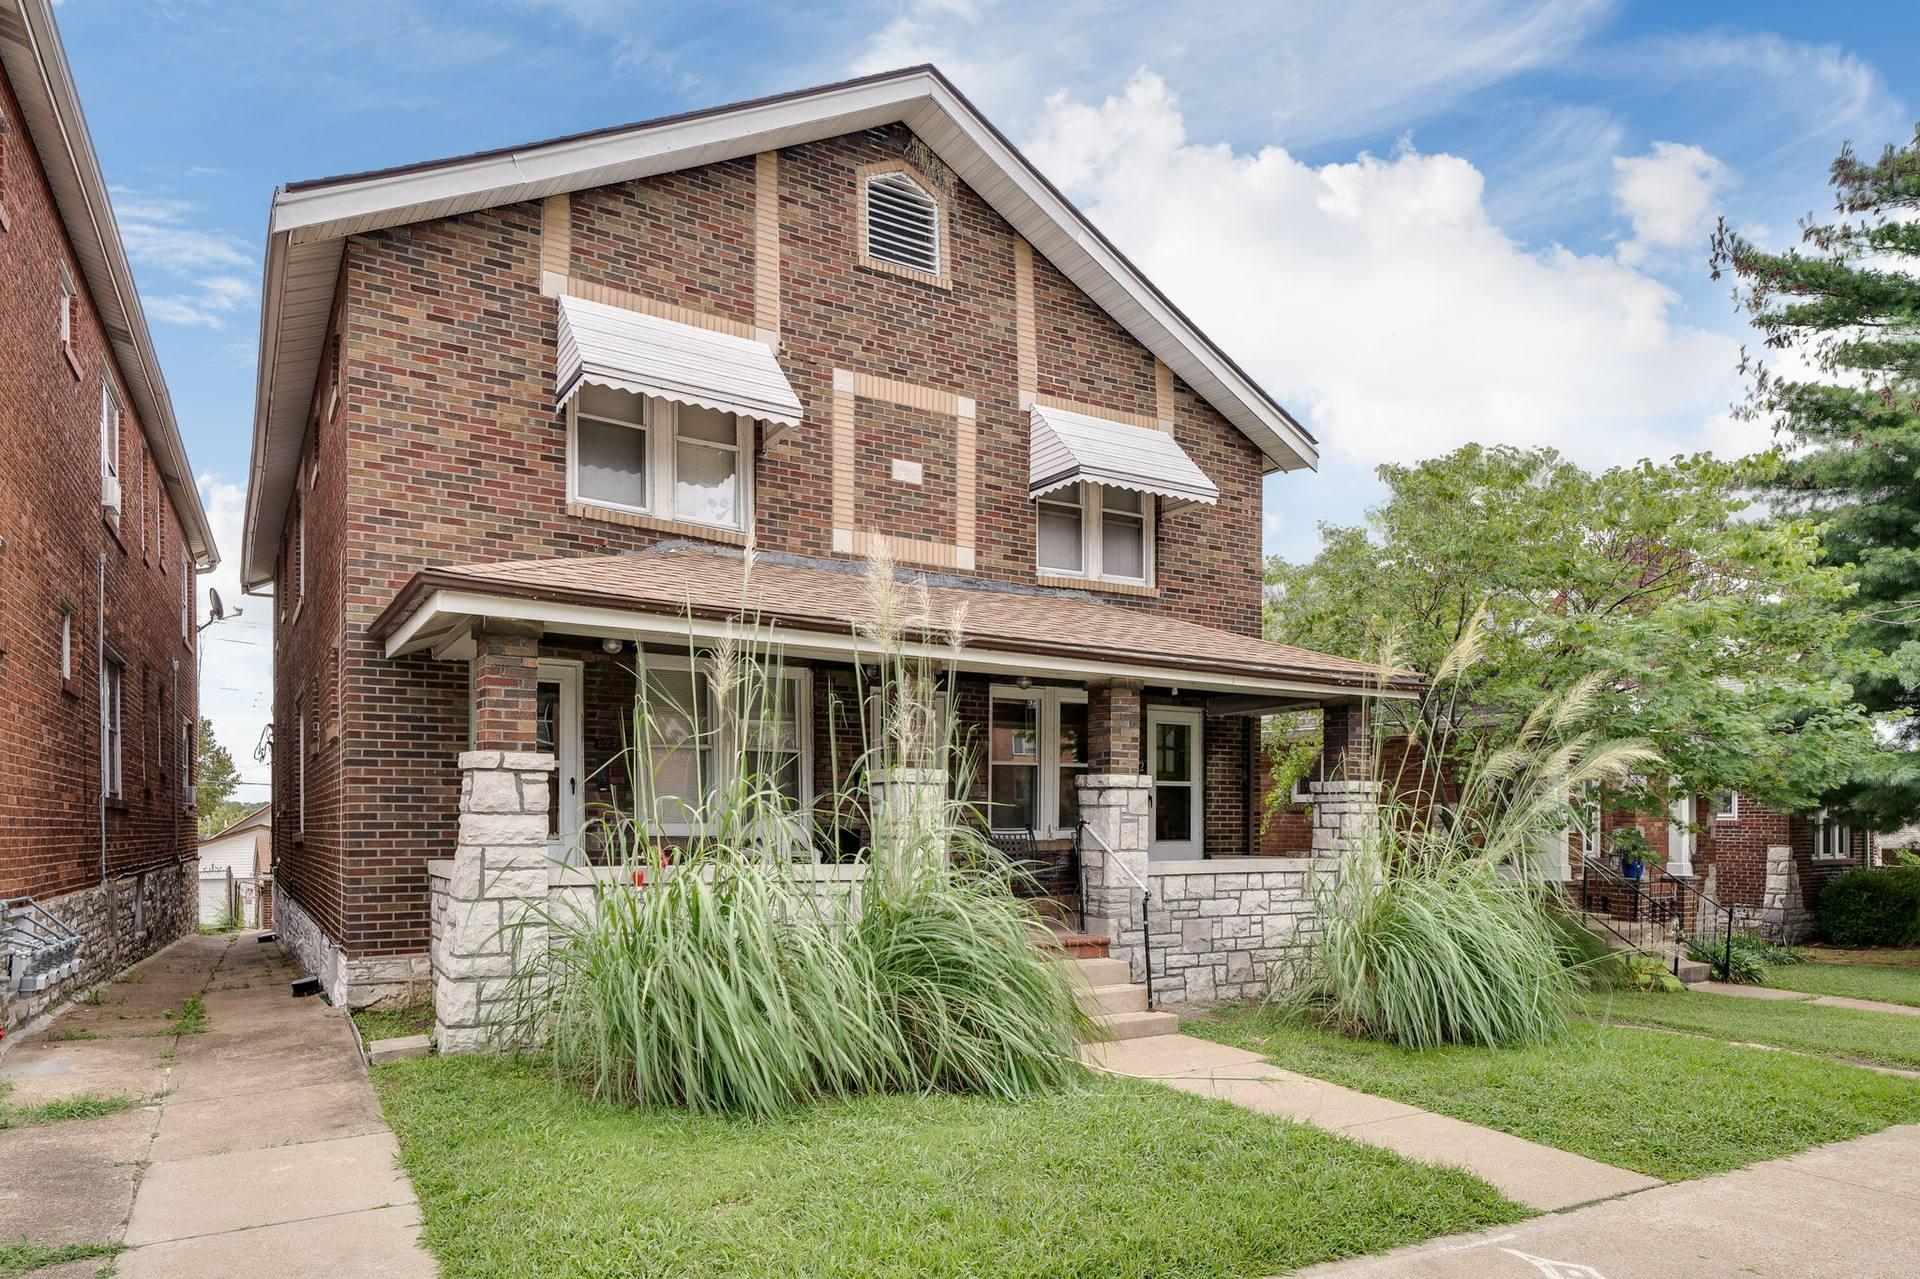 3250 Watson Rd, St. Louis, MO 63139, USA